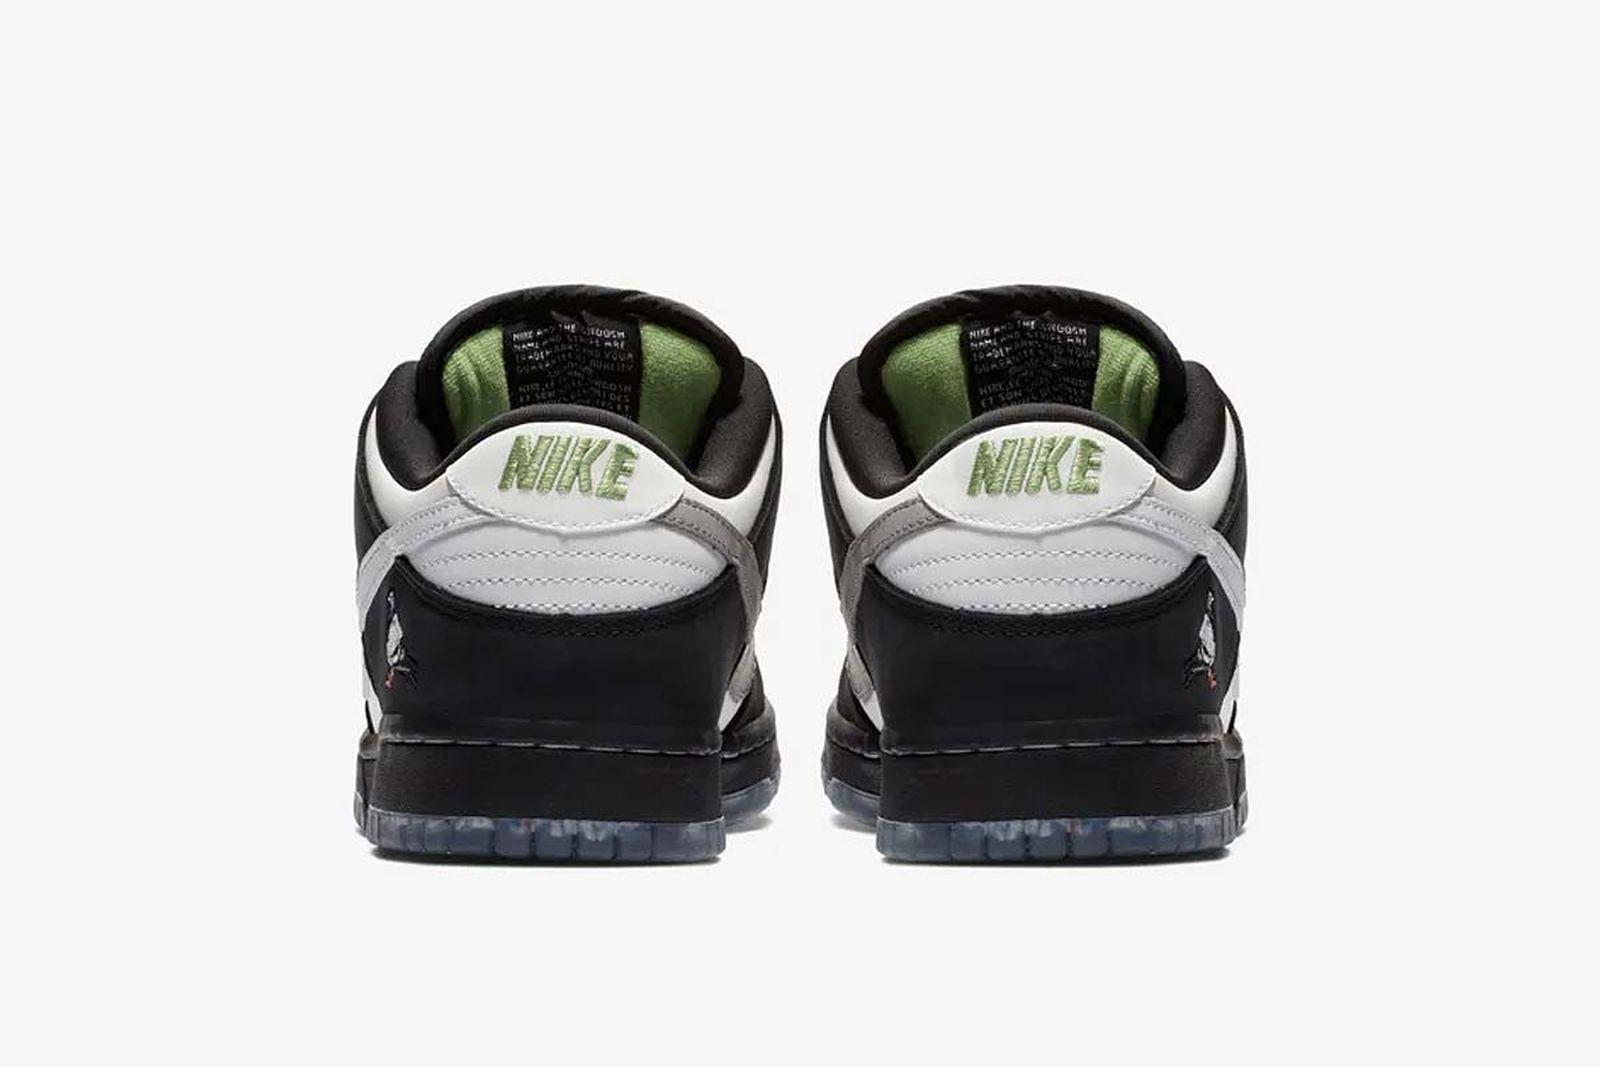 staple nike sb dunk panda pigeon release date price product Nike SB Dunk Pigeon dunk low jeff staple